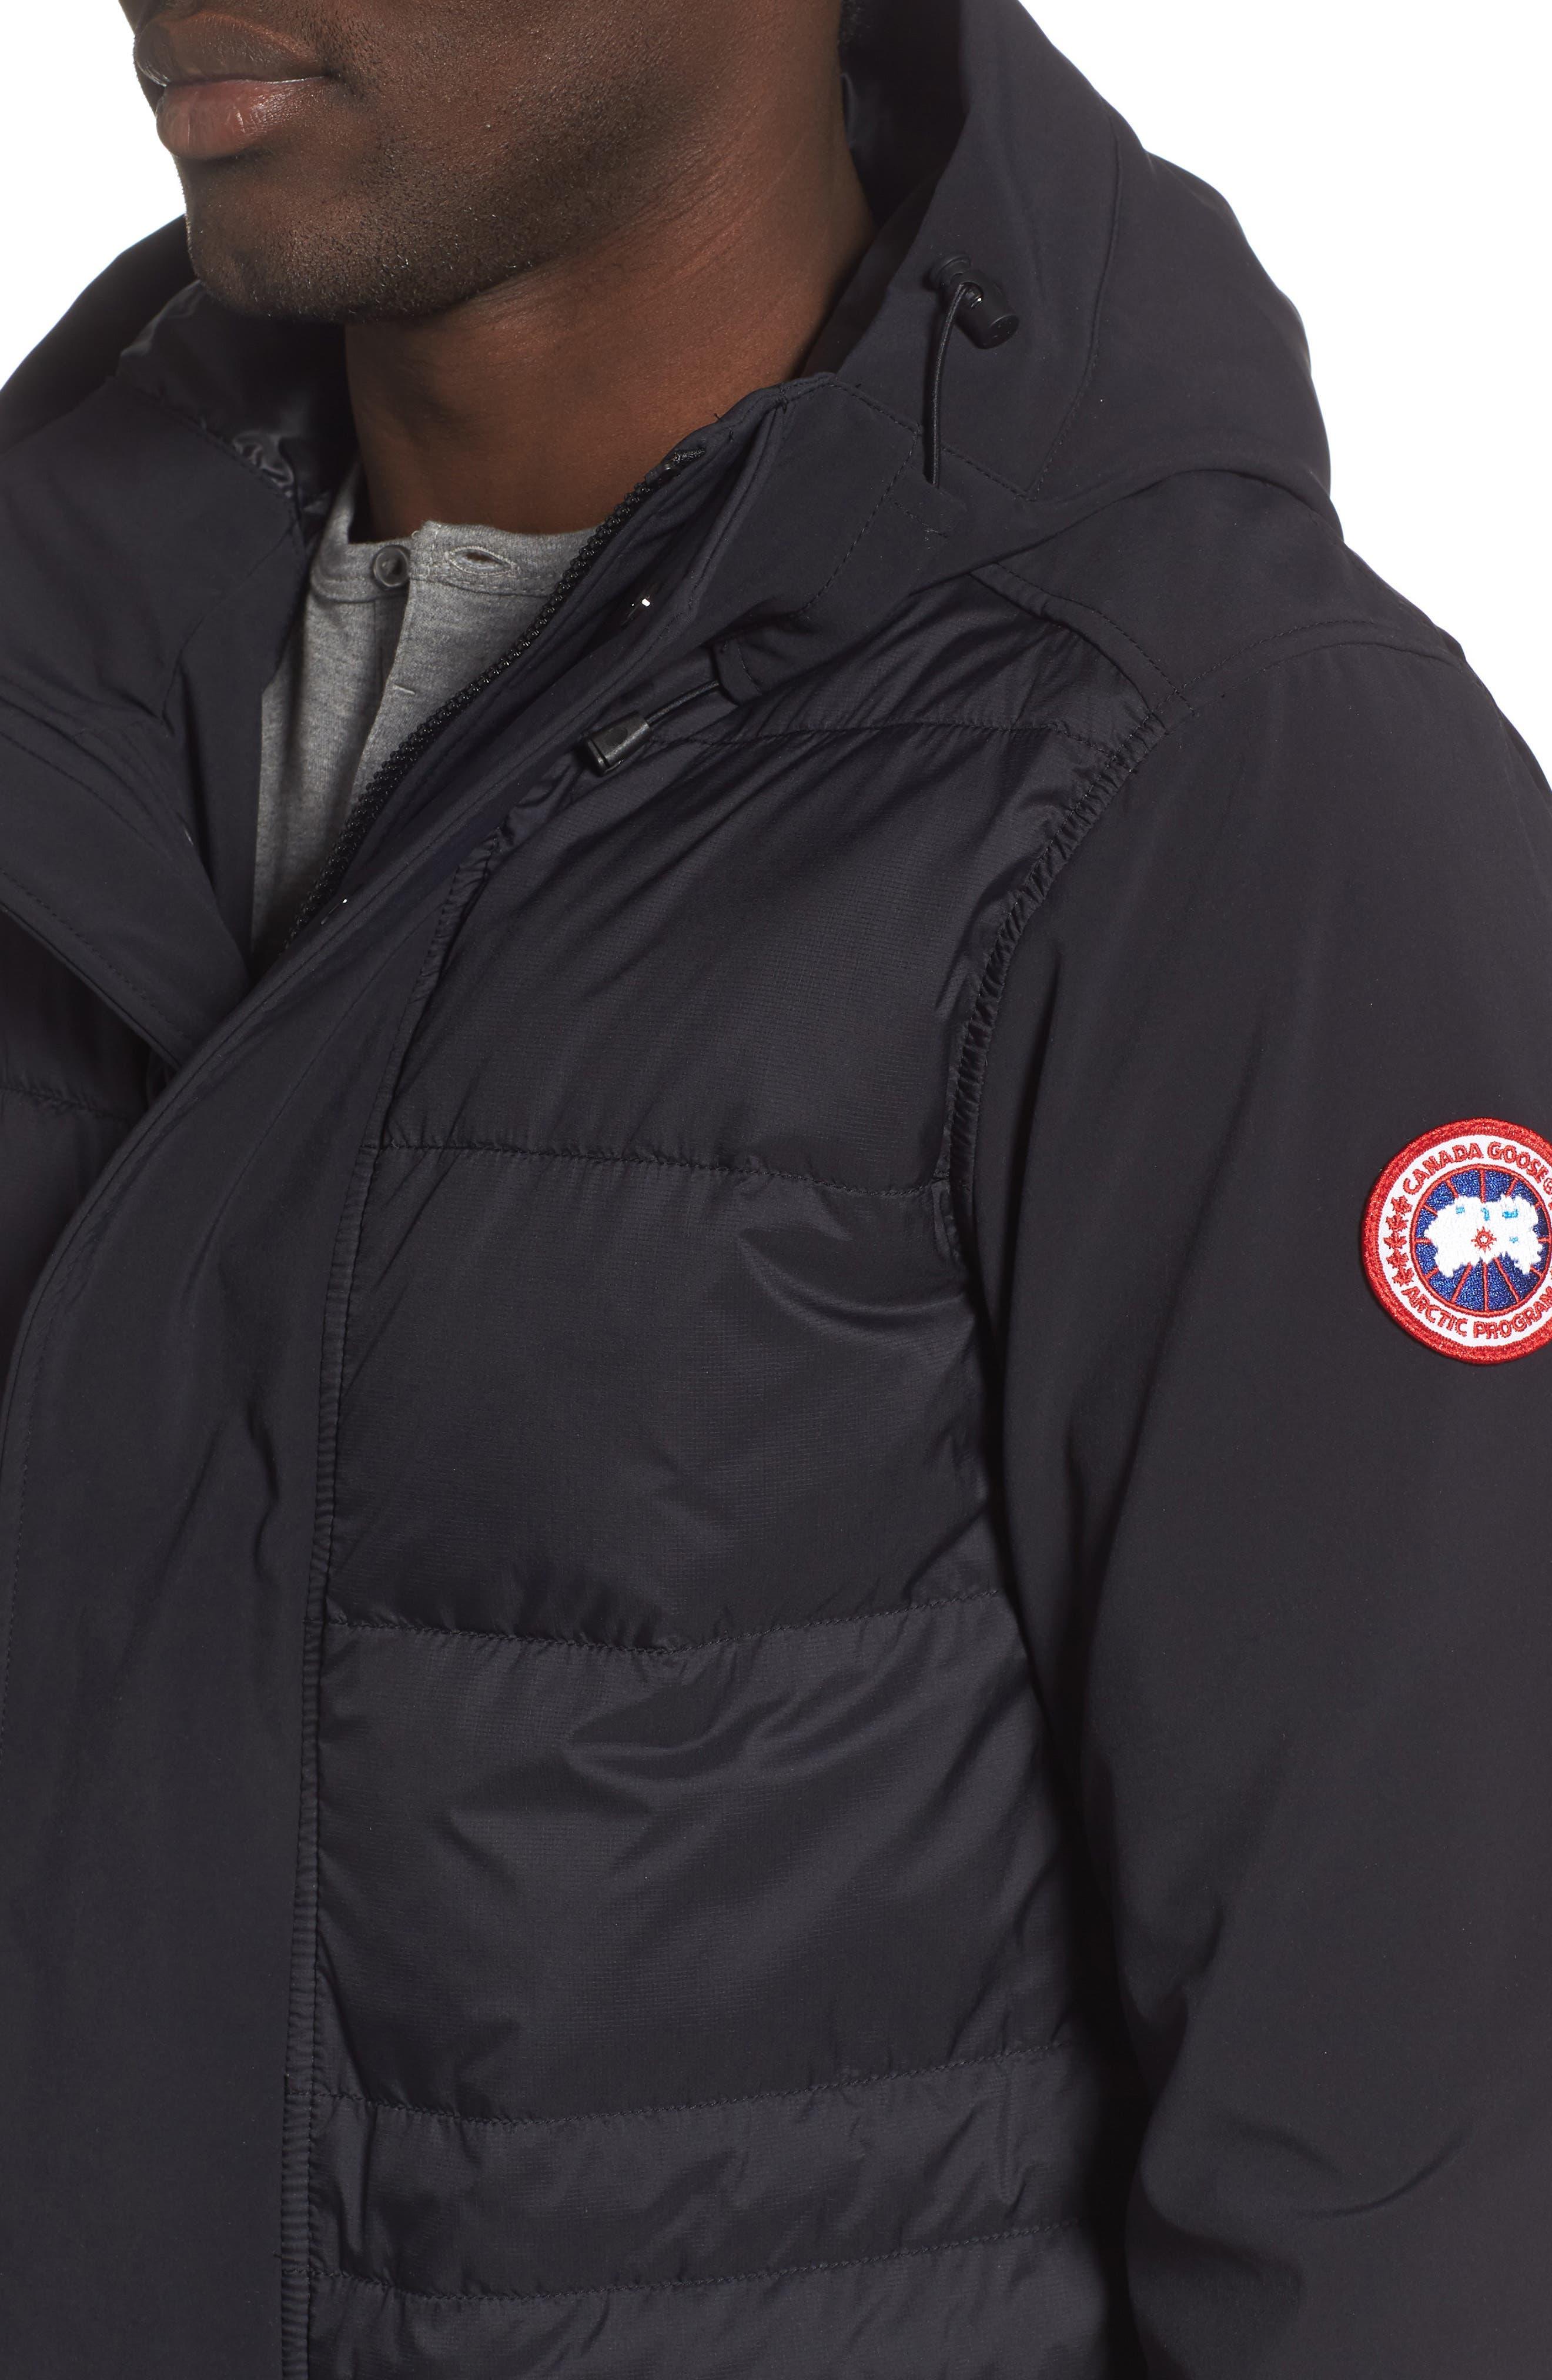 CANADA GOOSE,                             Breton 675-Fill Power Down Coat,                             Alternate thumbnail 4, color,                             BLACK